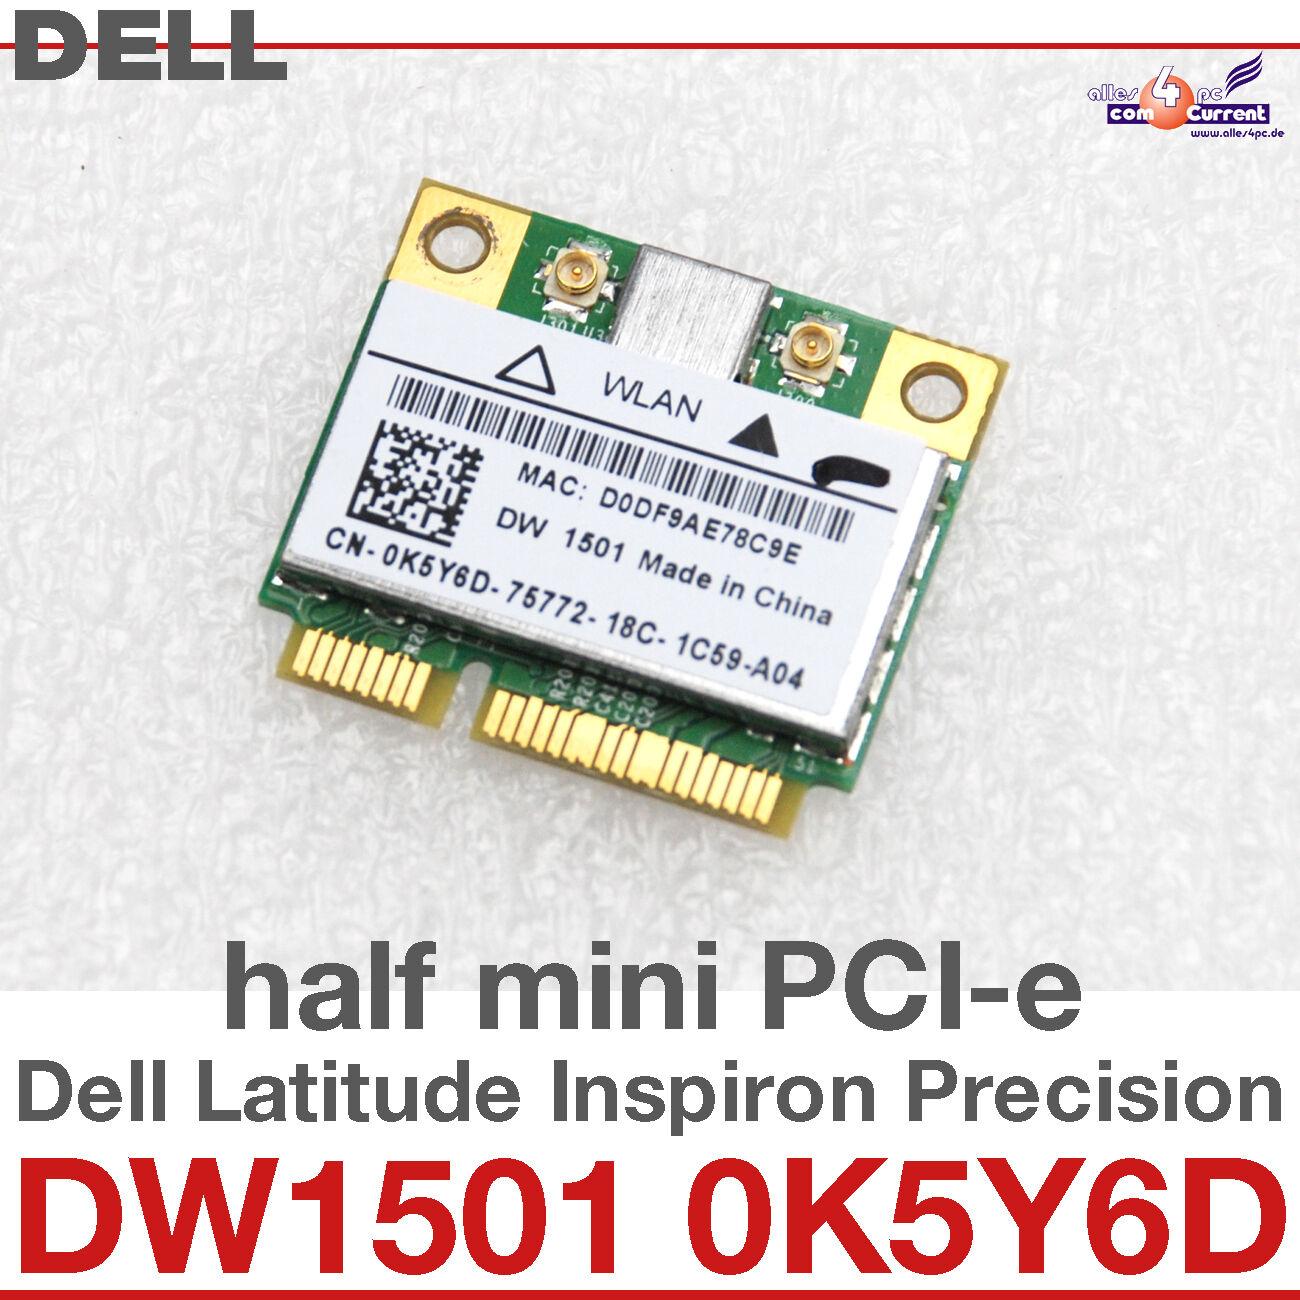 wi-Fi WLAN Wireless Card Network Card For Dell Mini Pci-E DW1501 0K5Y6D #D19